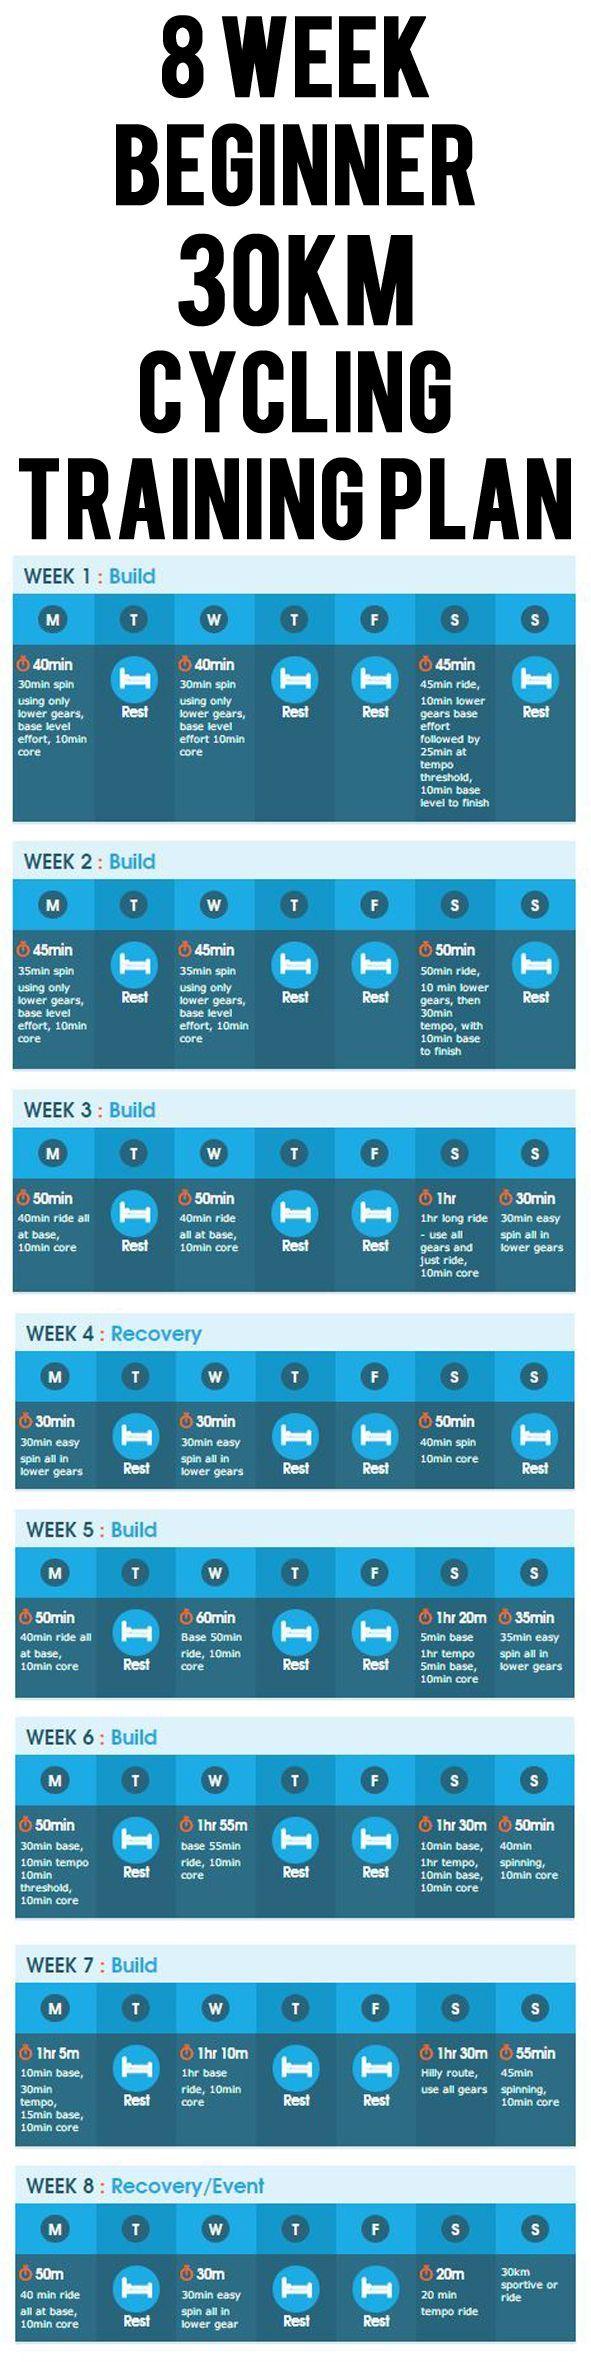 8 WEEK BEGINNER 30KM CYCLING TRAINING PLAN